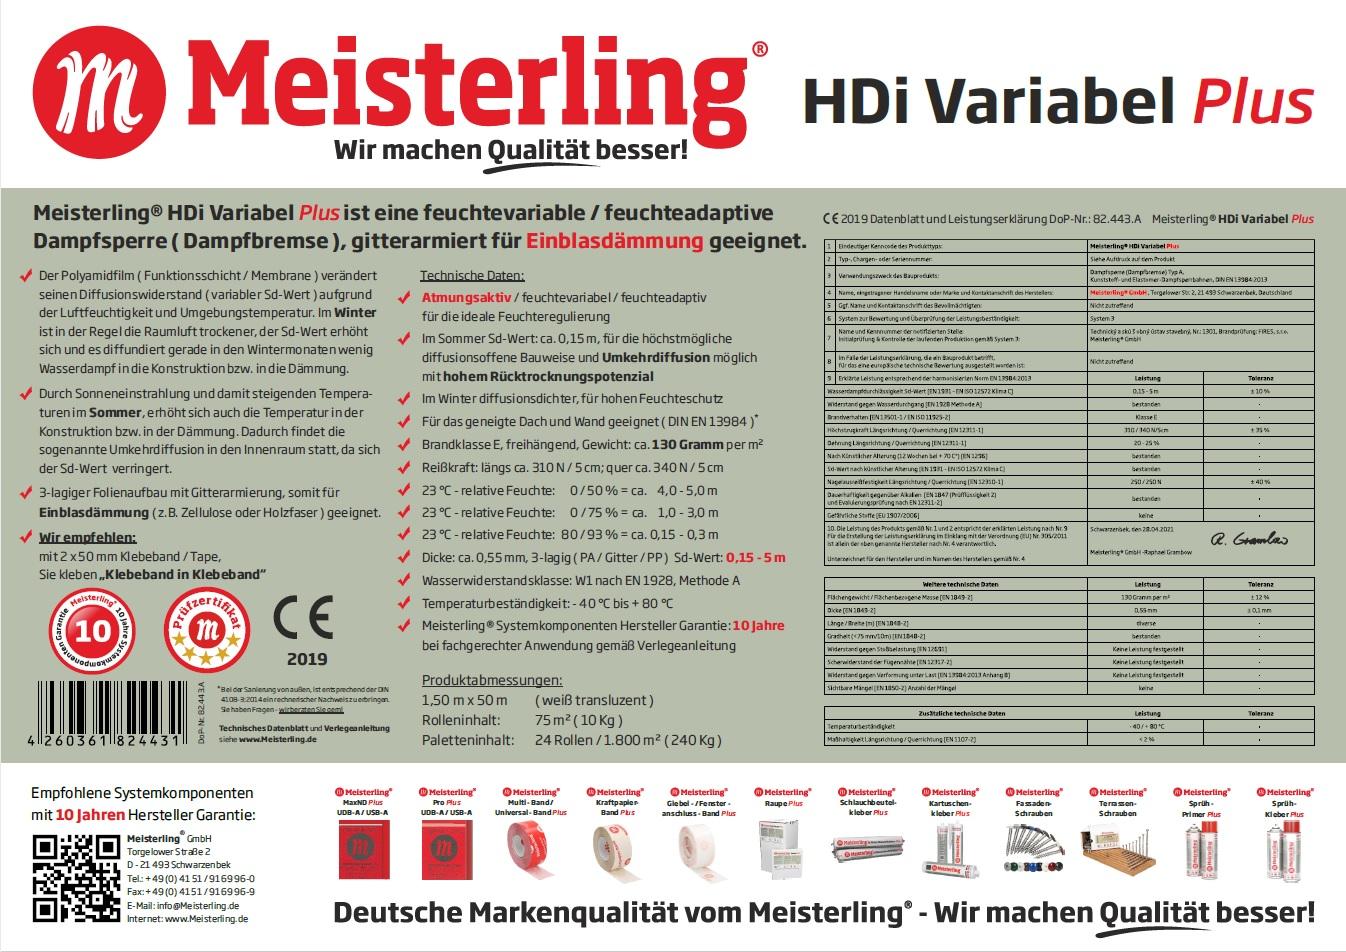 Meisterling® HDi Variabel PLUS Technische Daten